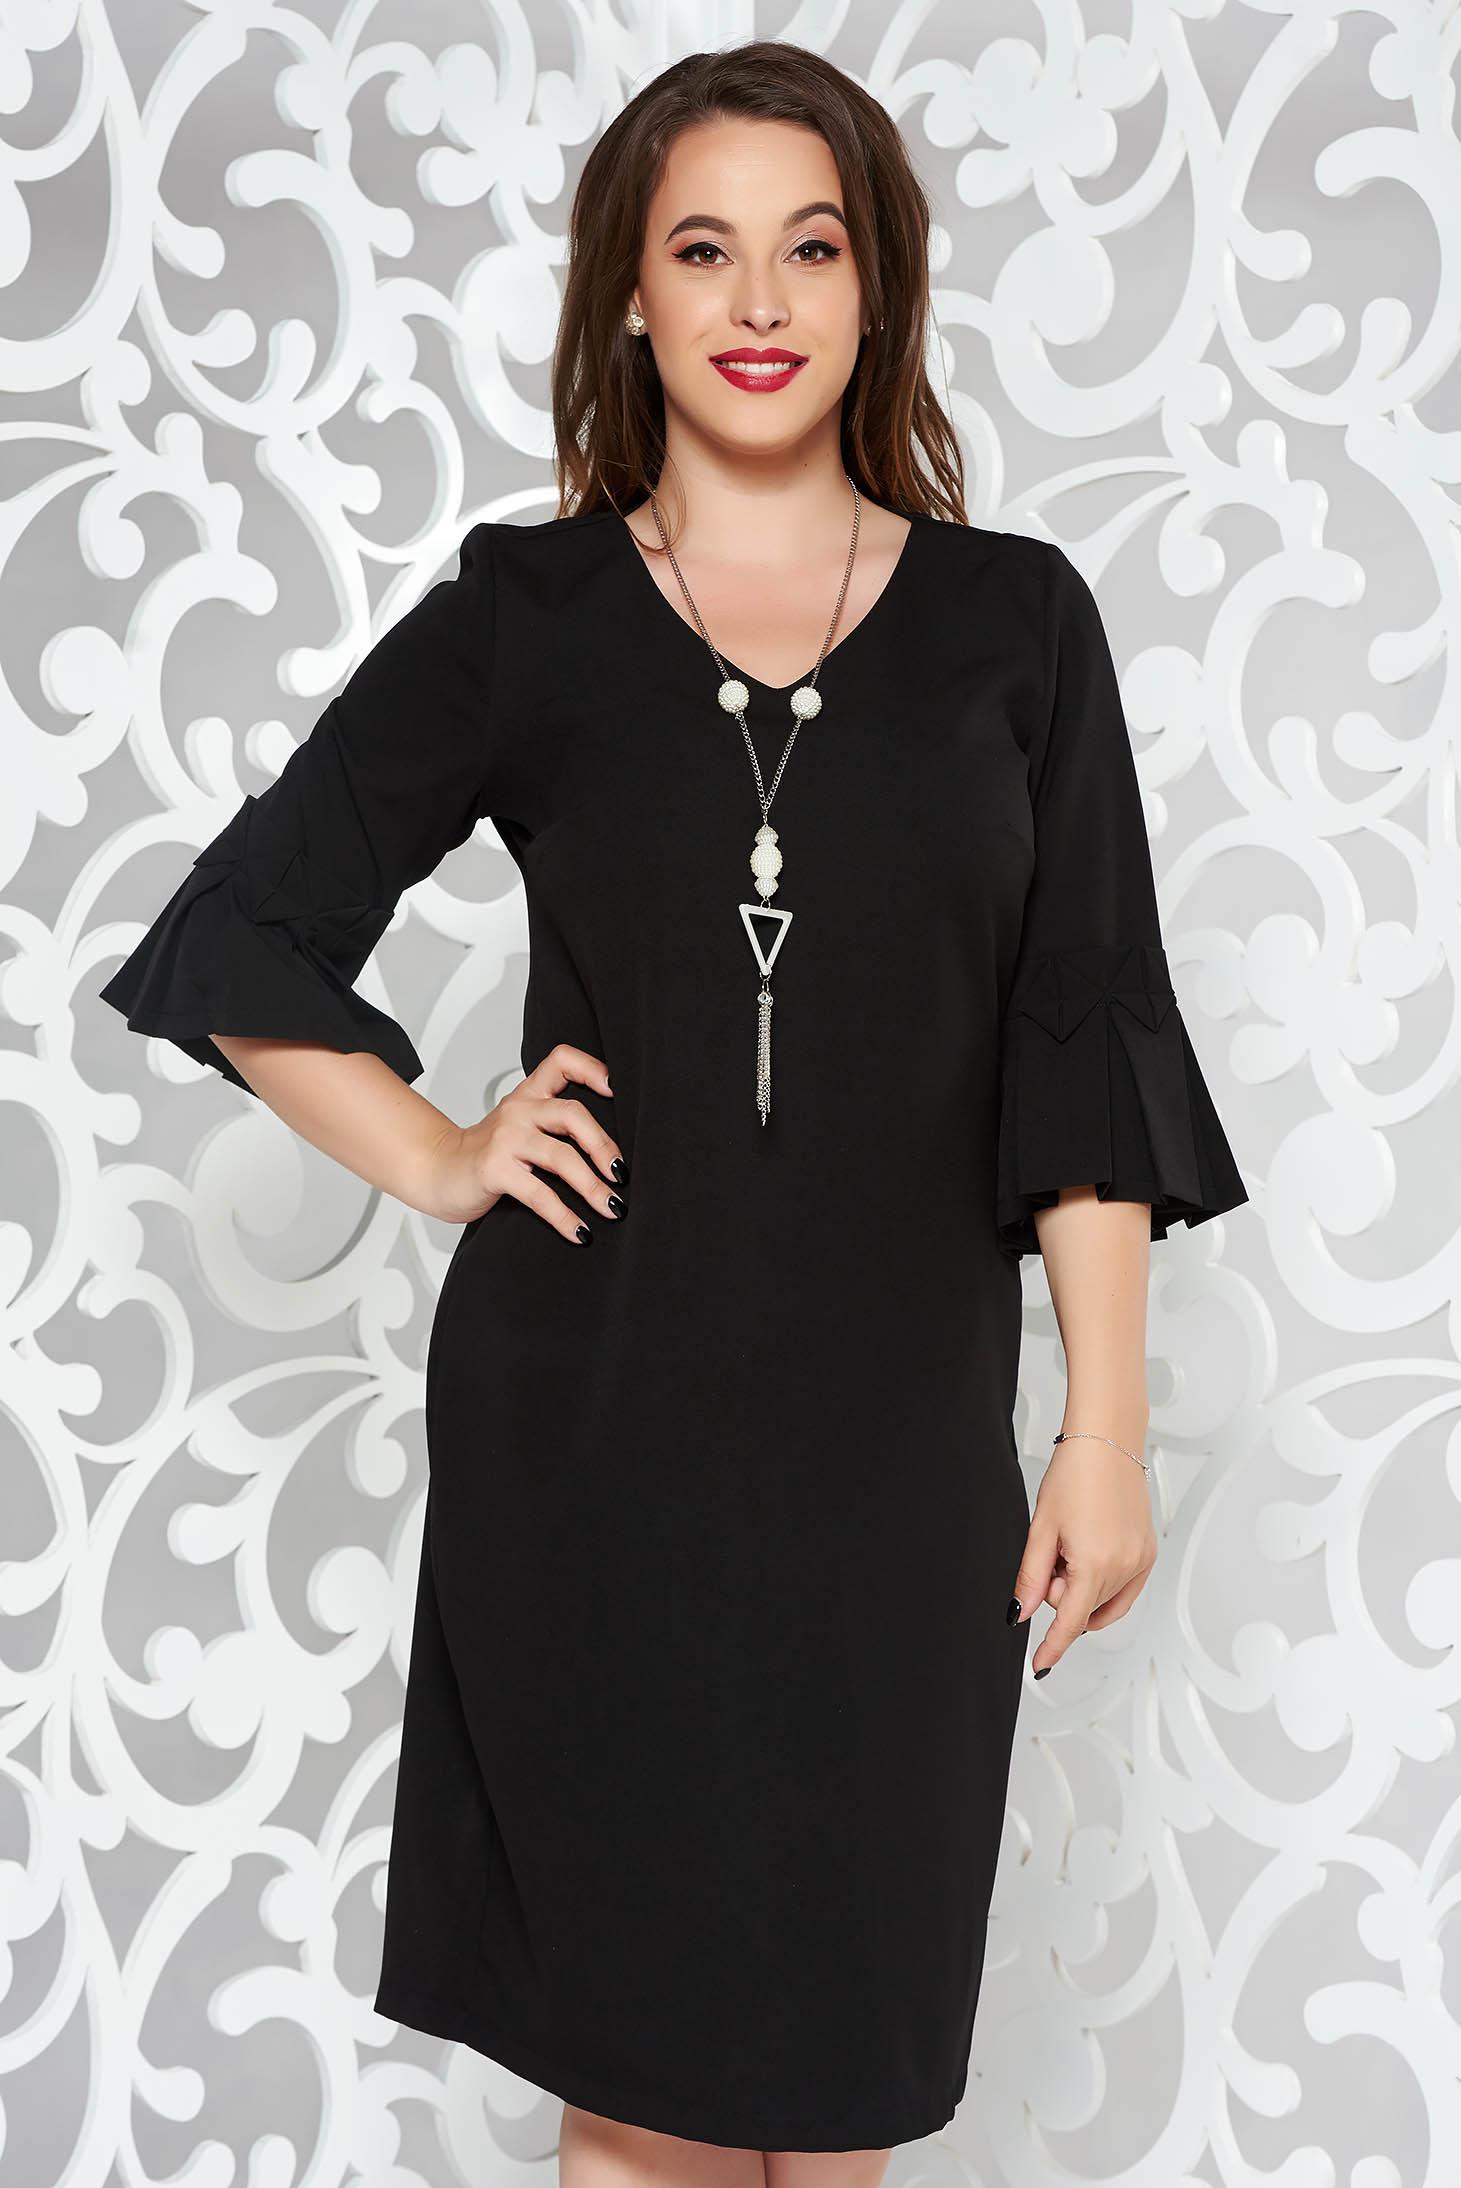 Black dress elegant pencil slightly elastic fabric midi accesorised with necklace